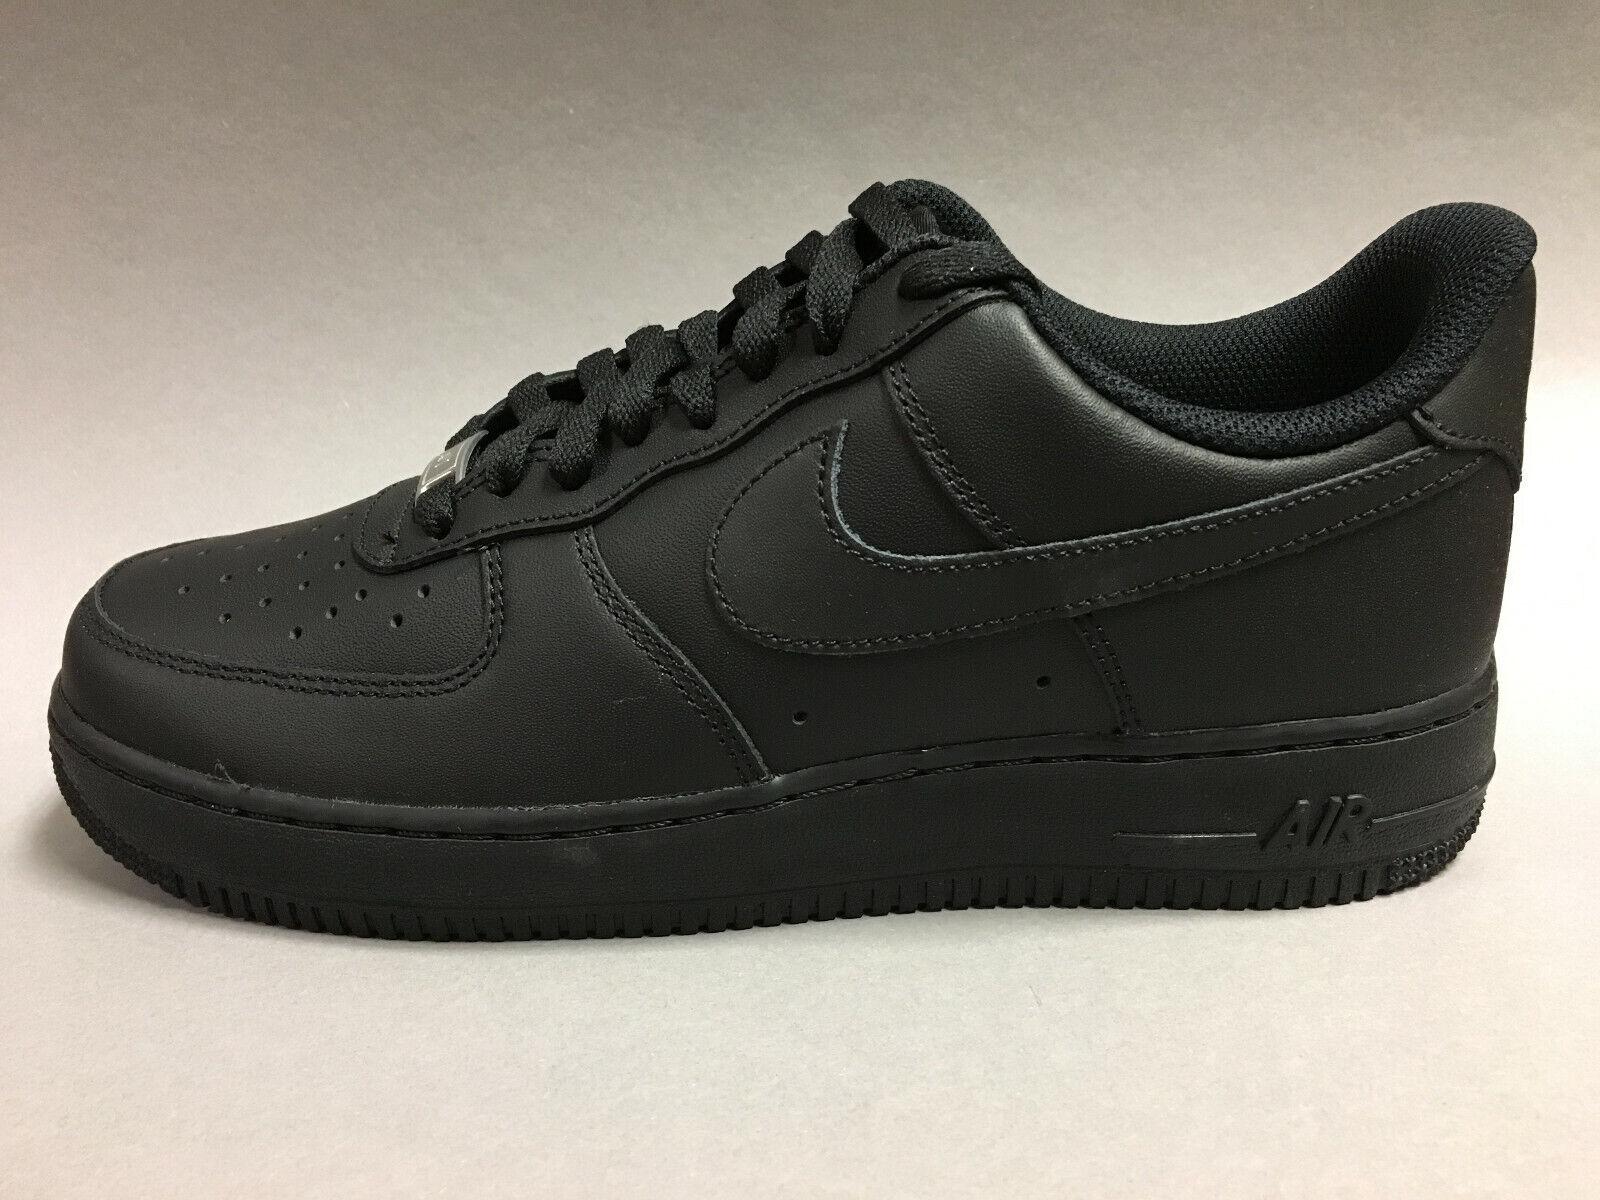 Herren Air Force 1 07 Sneakers – Dein Schnäppchen Portal!